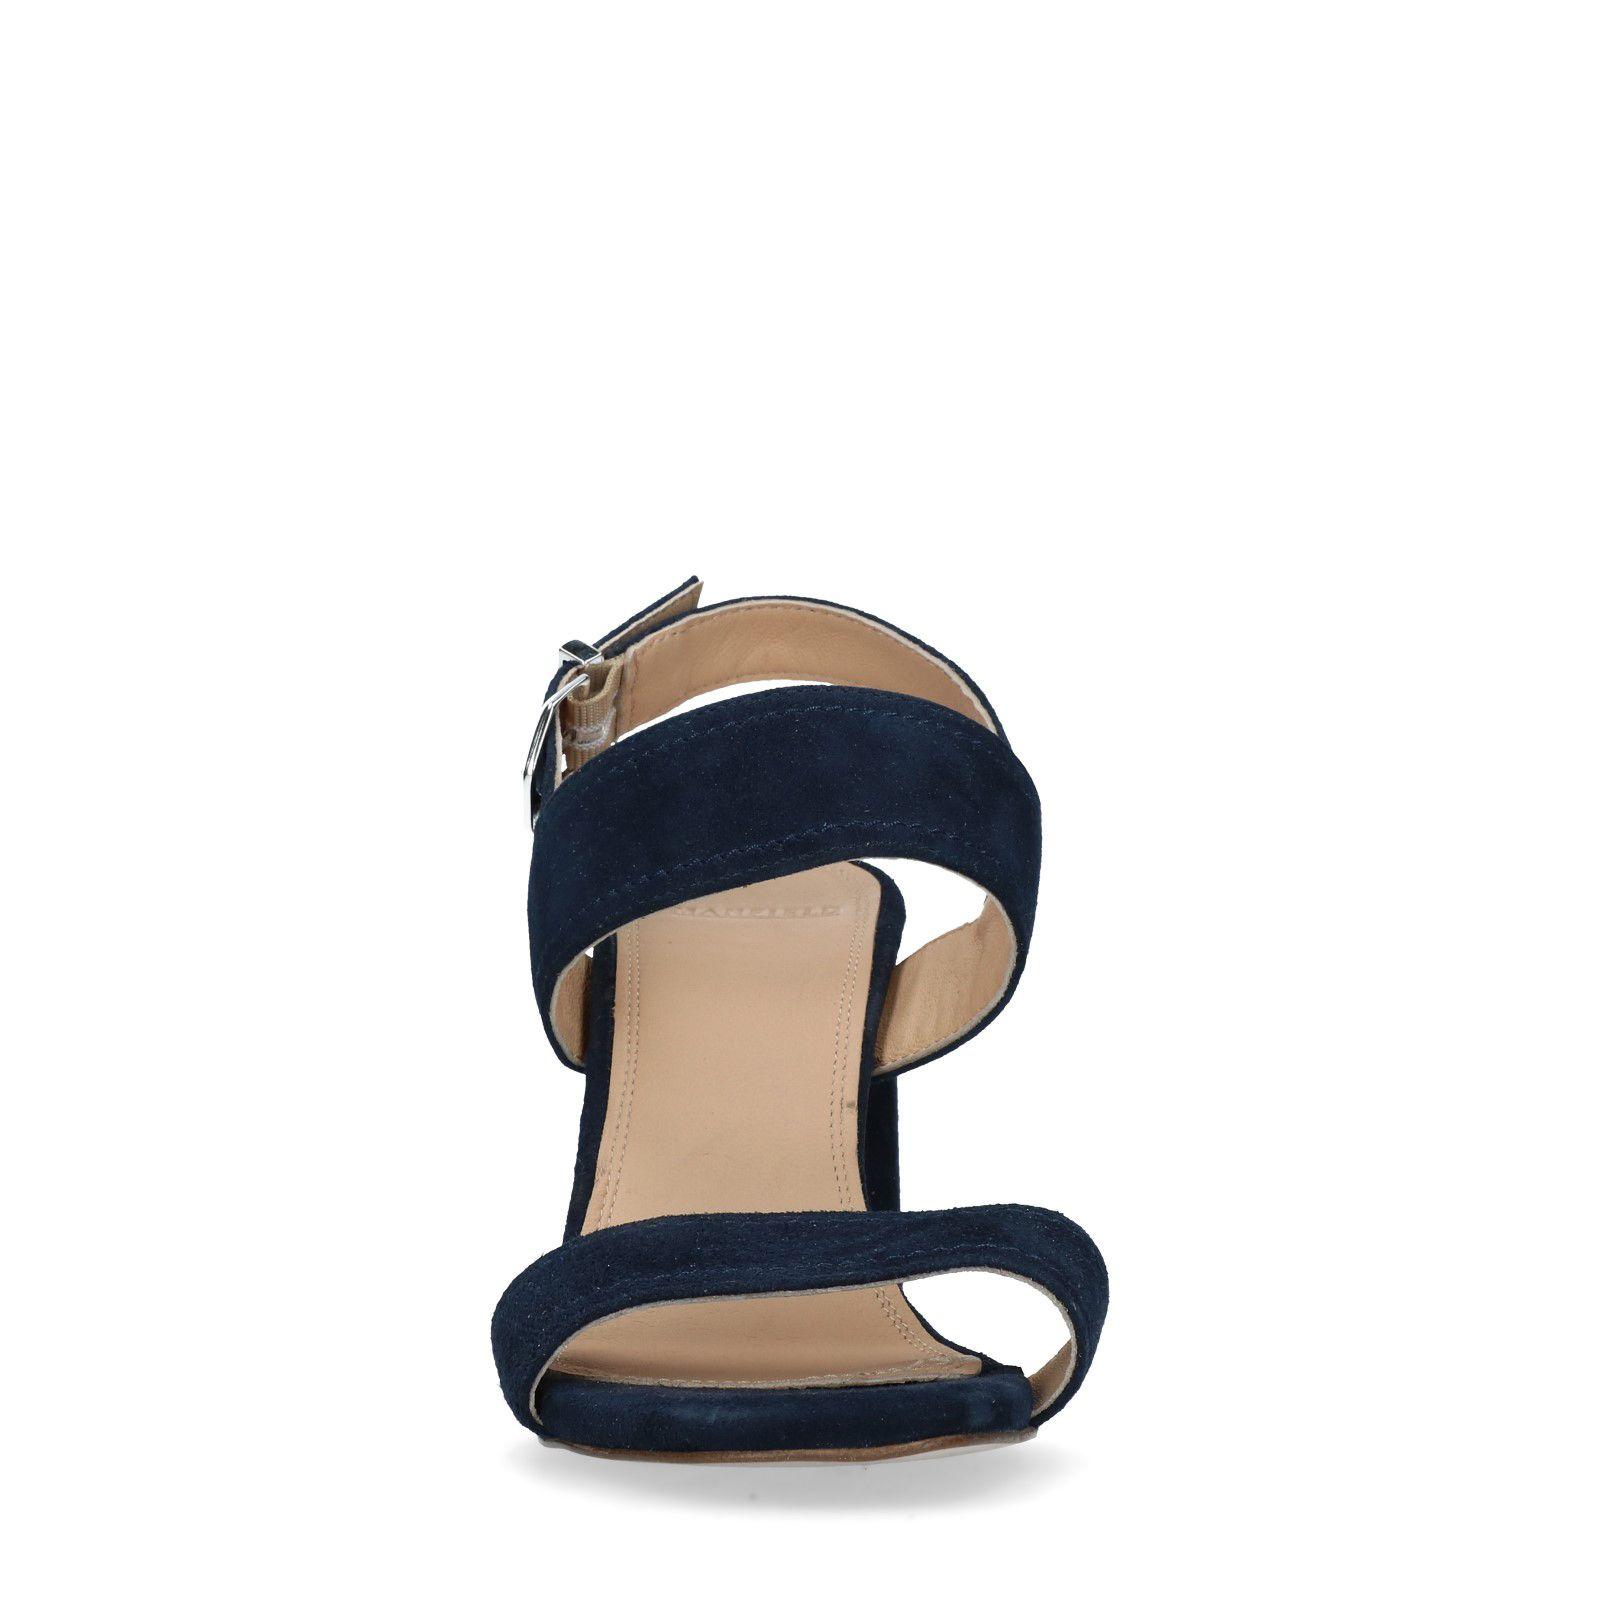 Sandaletten Mit Dunkelblaue Dunkelblaue Sandaletten Blockabsatz LqSUzMpGV